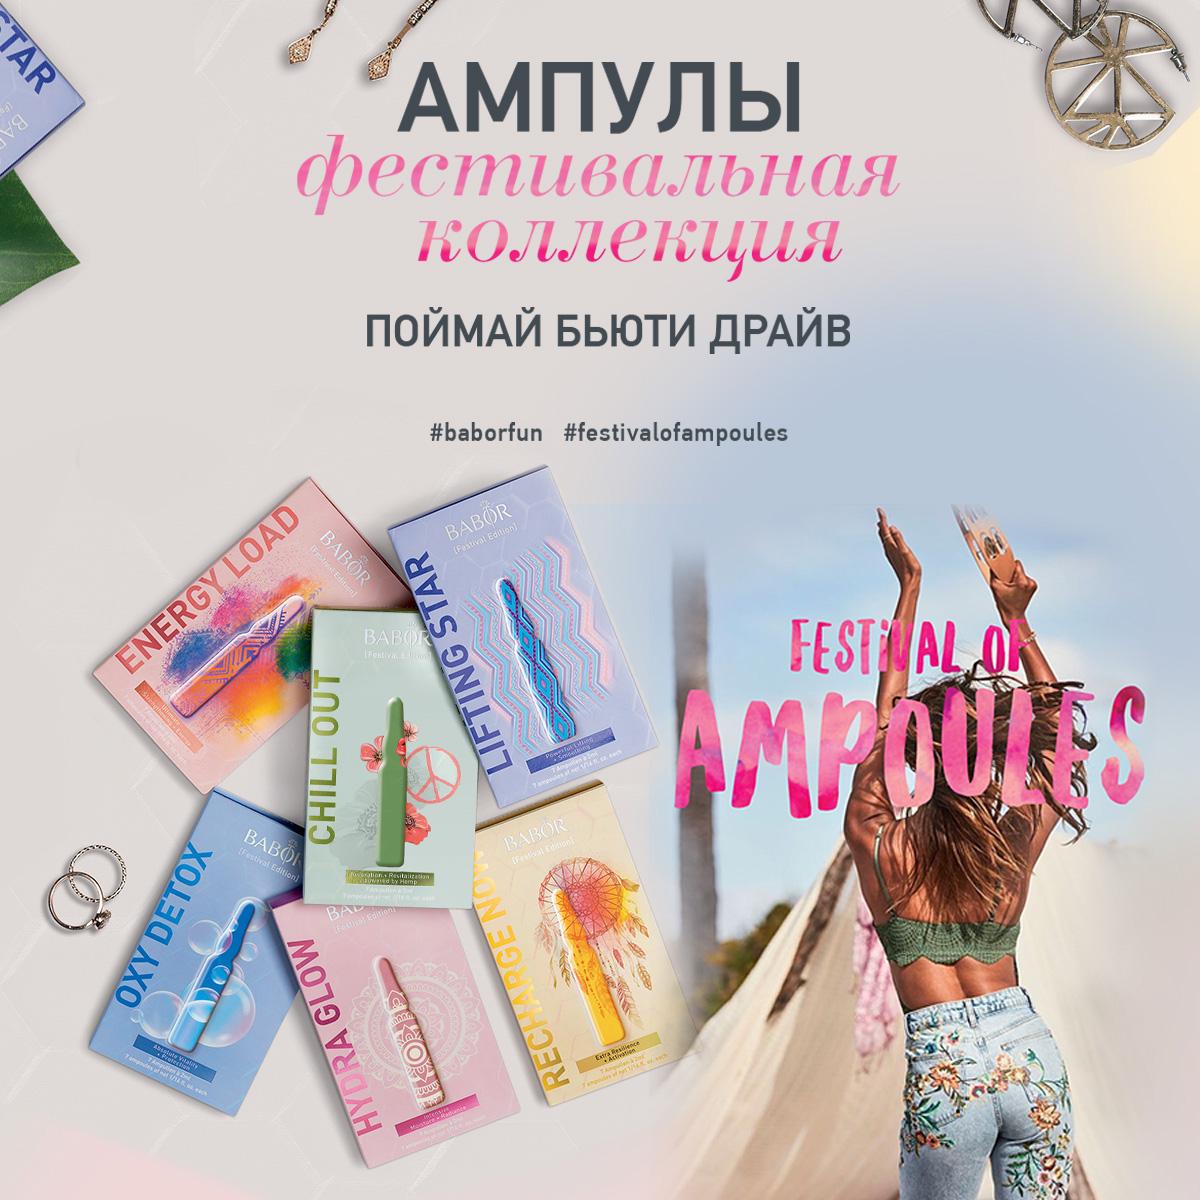 Ампулы Фестивальная Коллекция